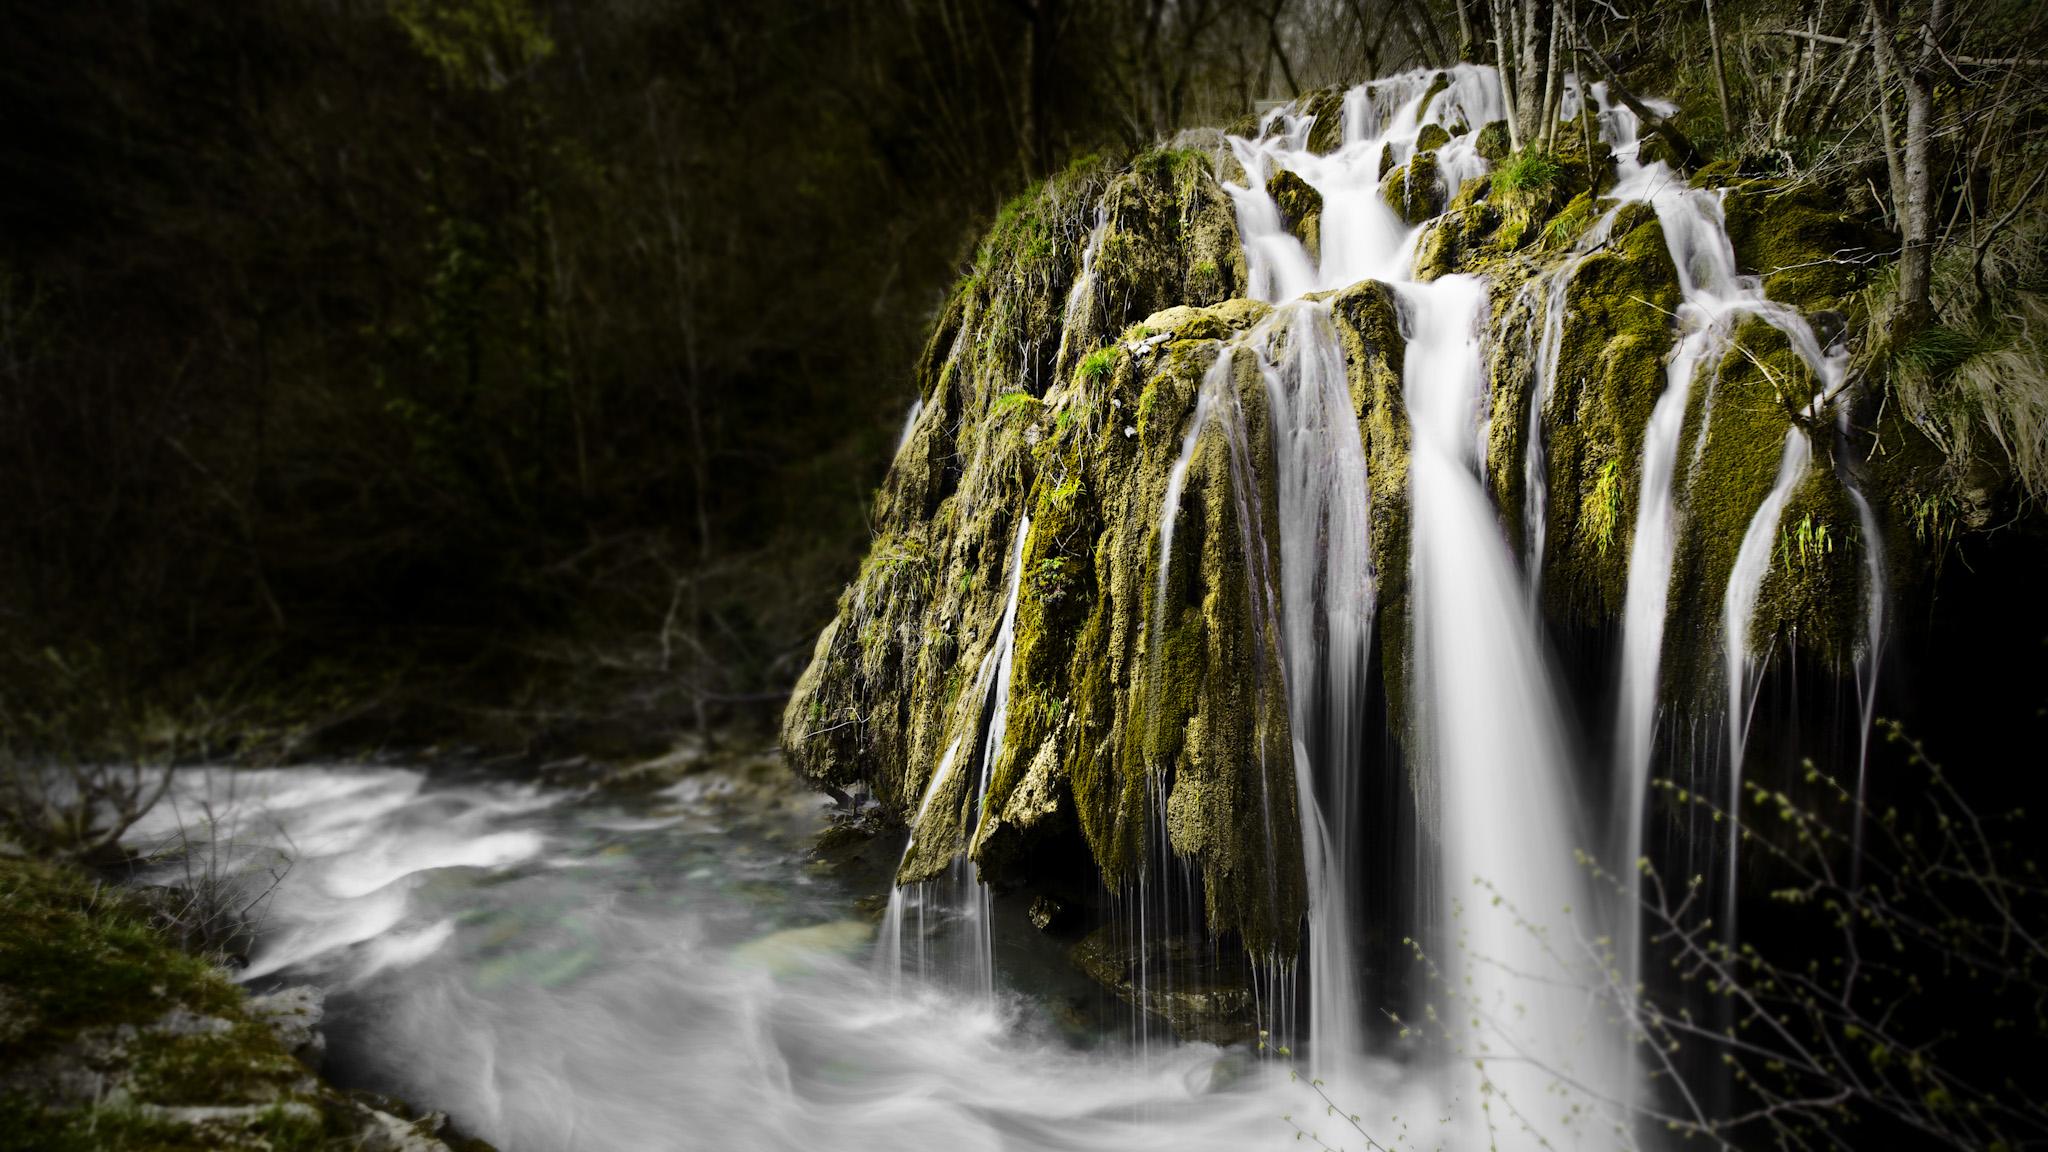 Cascada de Aydius - Vallée d´Aspe - Fotos del Valle del Aragón, Mikel Besga